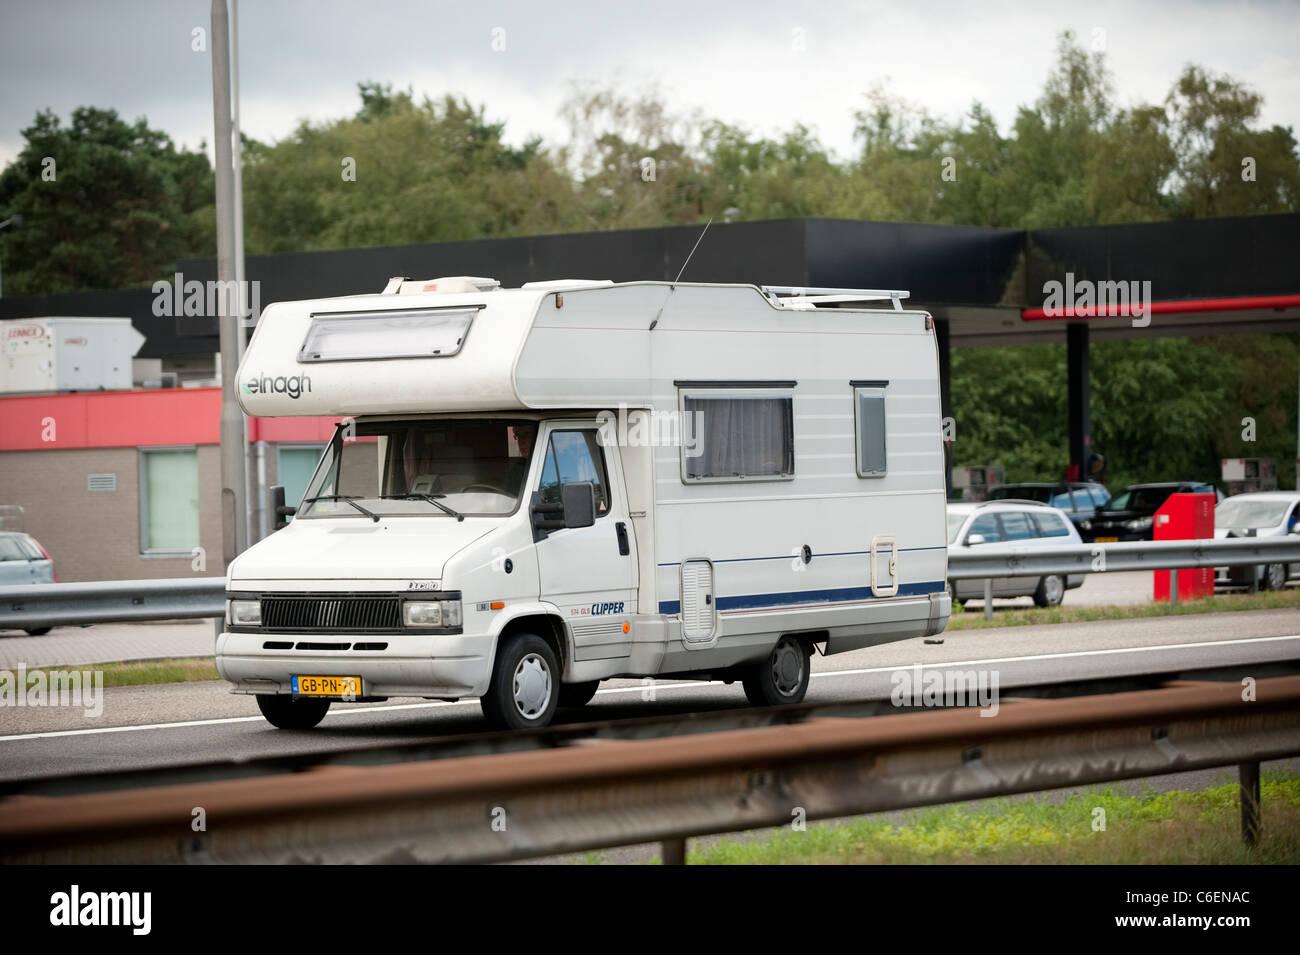 Campervan Motorhome Ede Holland Netherlands Europe Stock Photo - Alamy